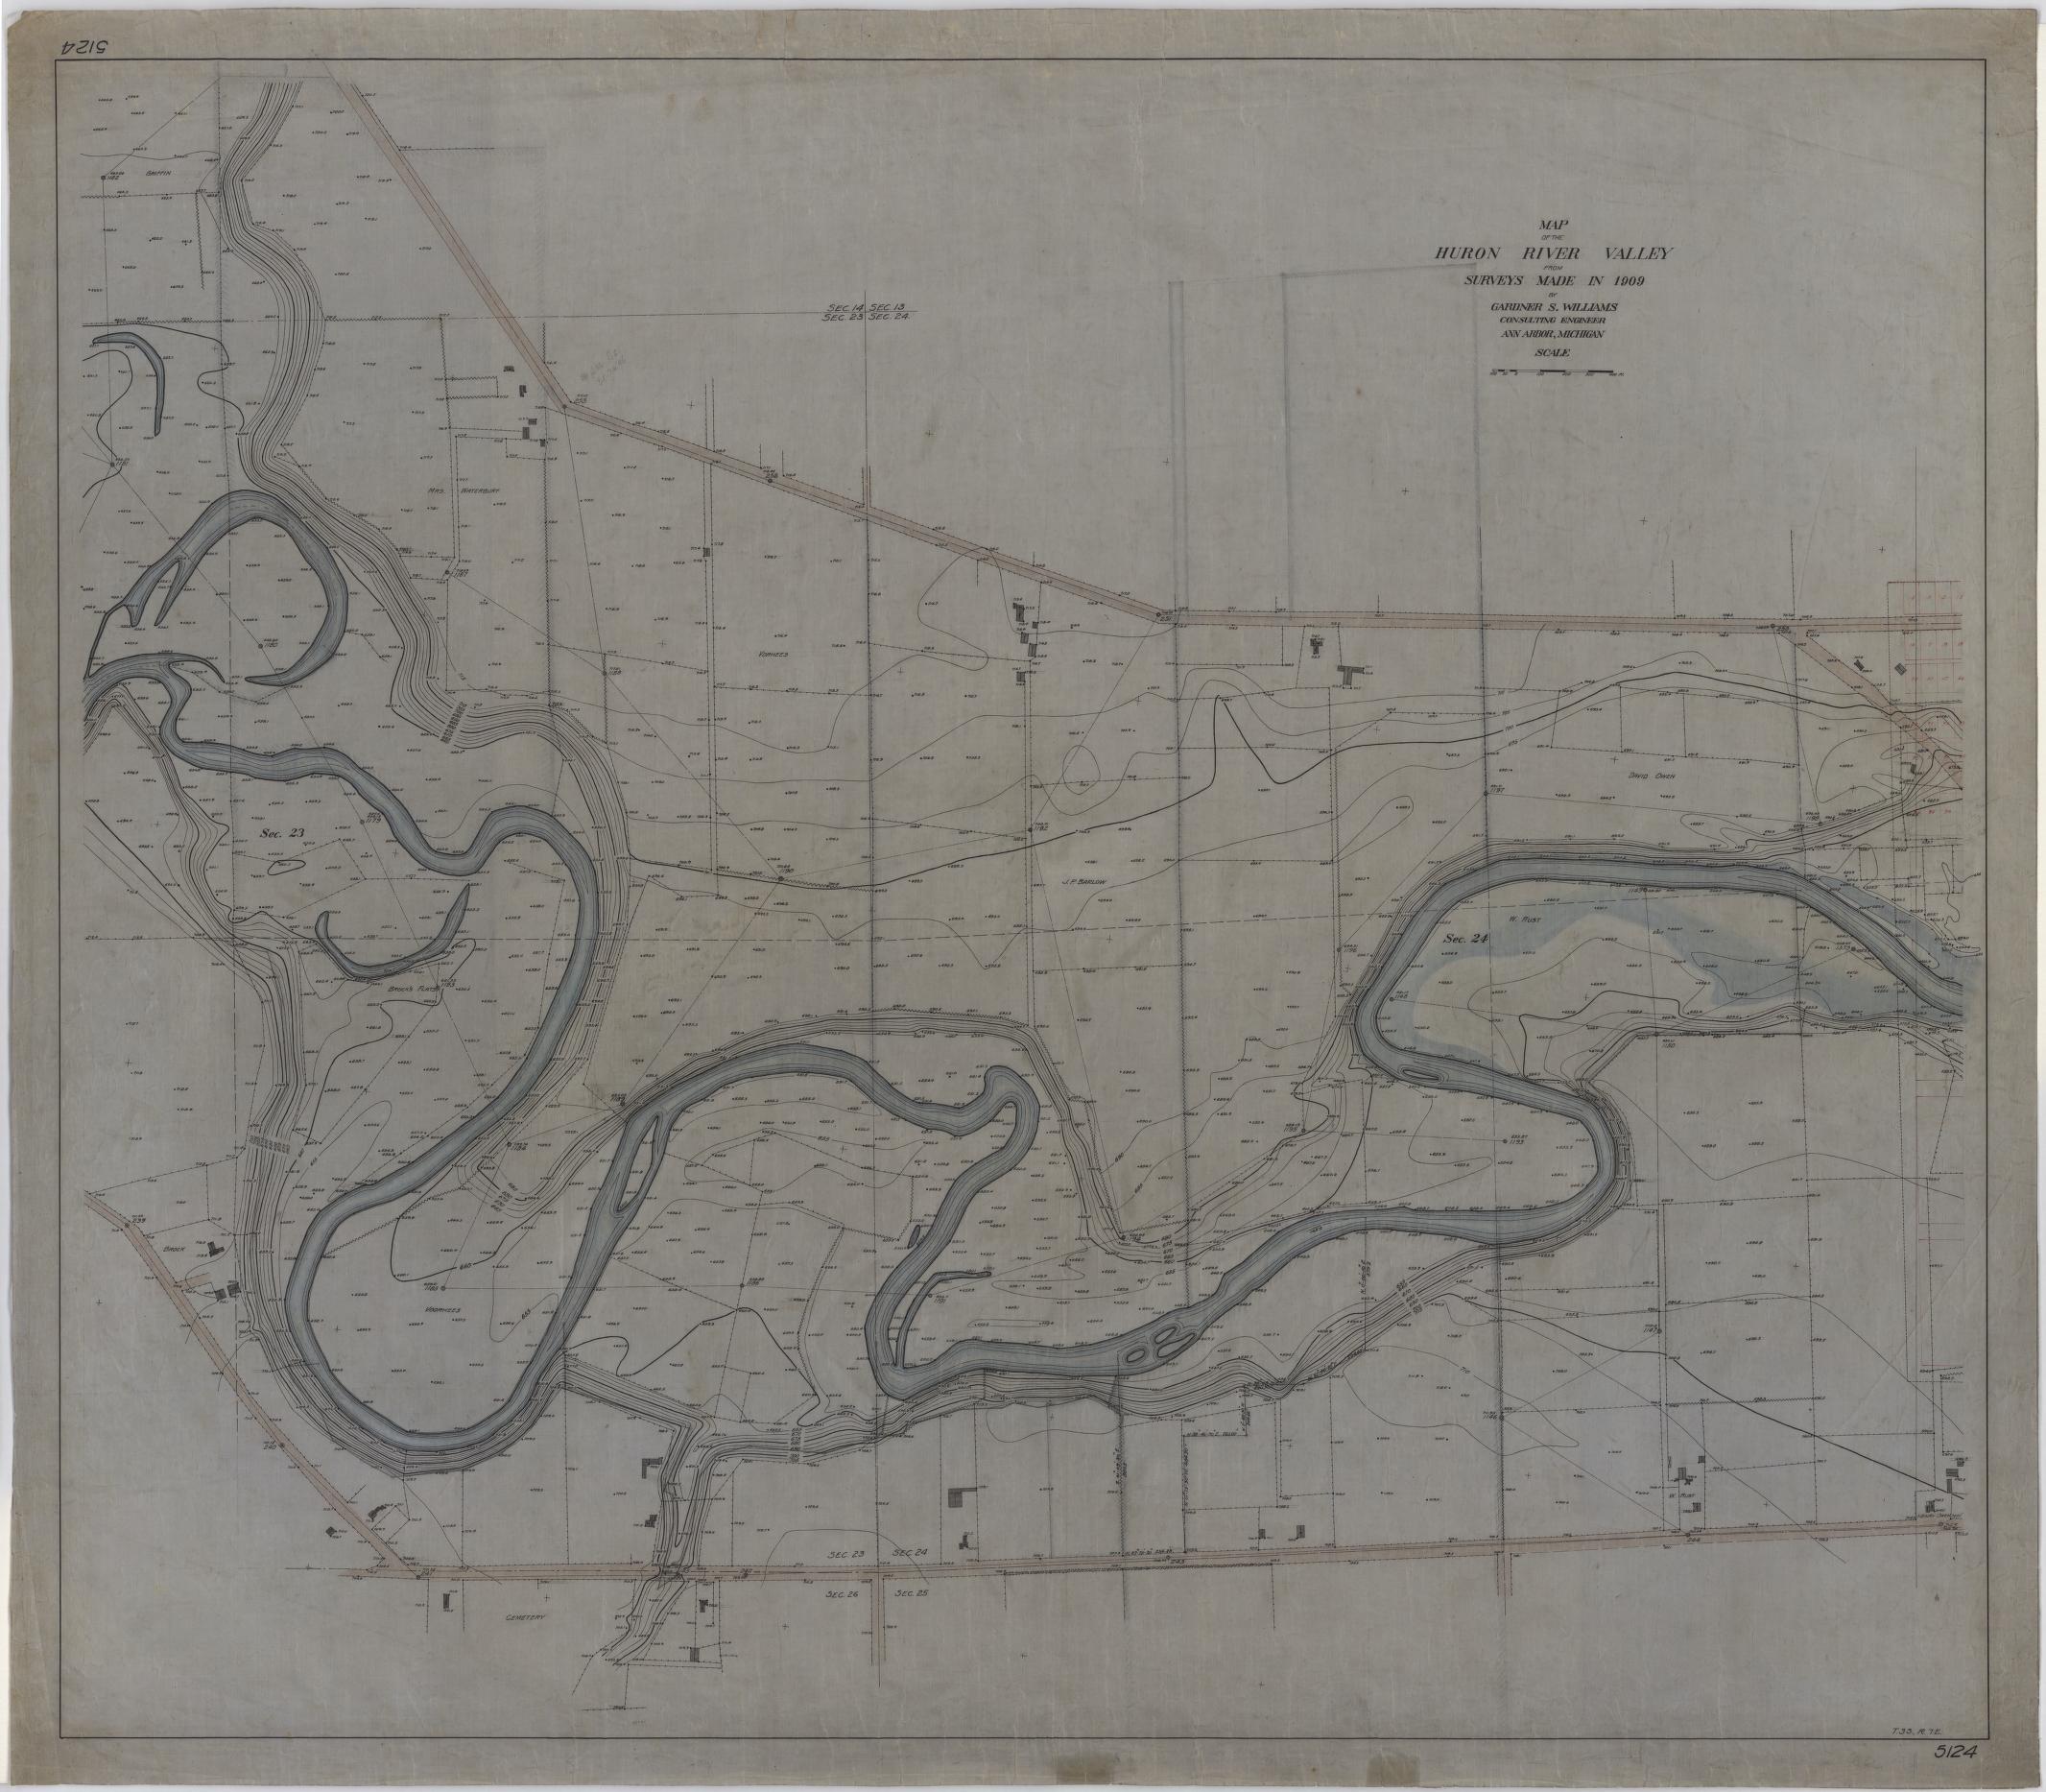 Bentley Image Bank, Bentley Historical Library: Map of the Huron